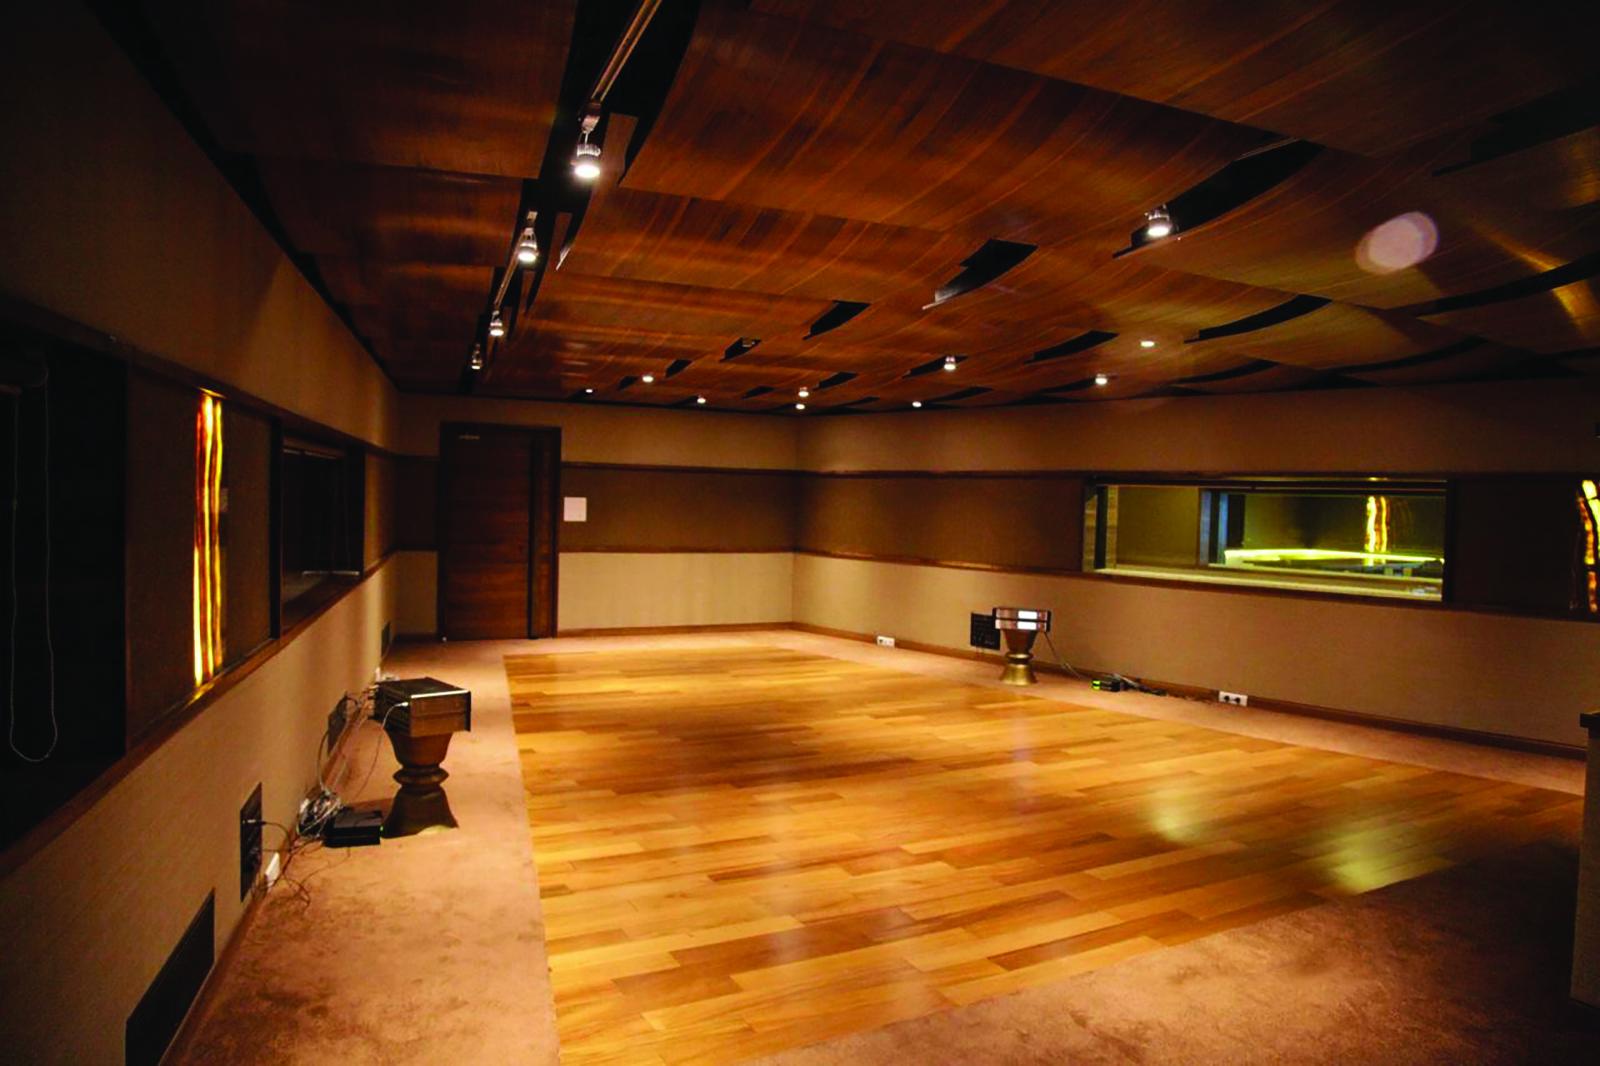 ENZY Studios in Mumbai